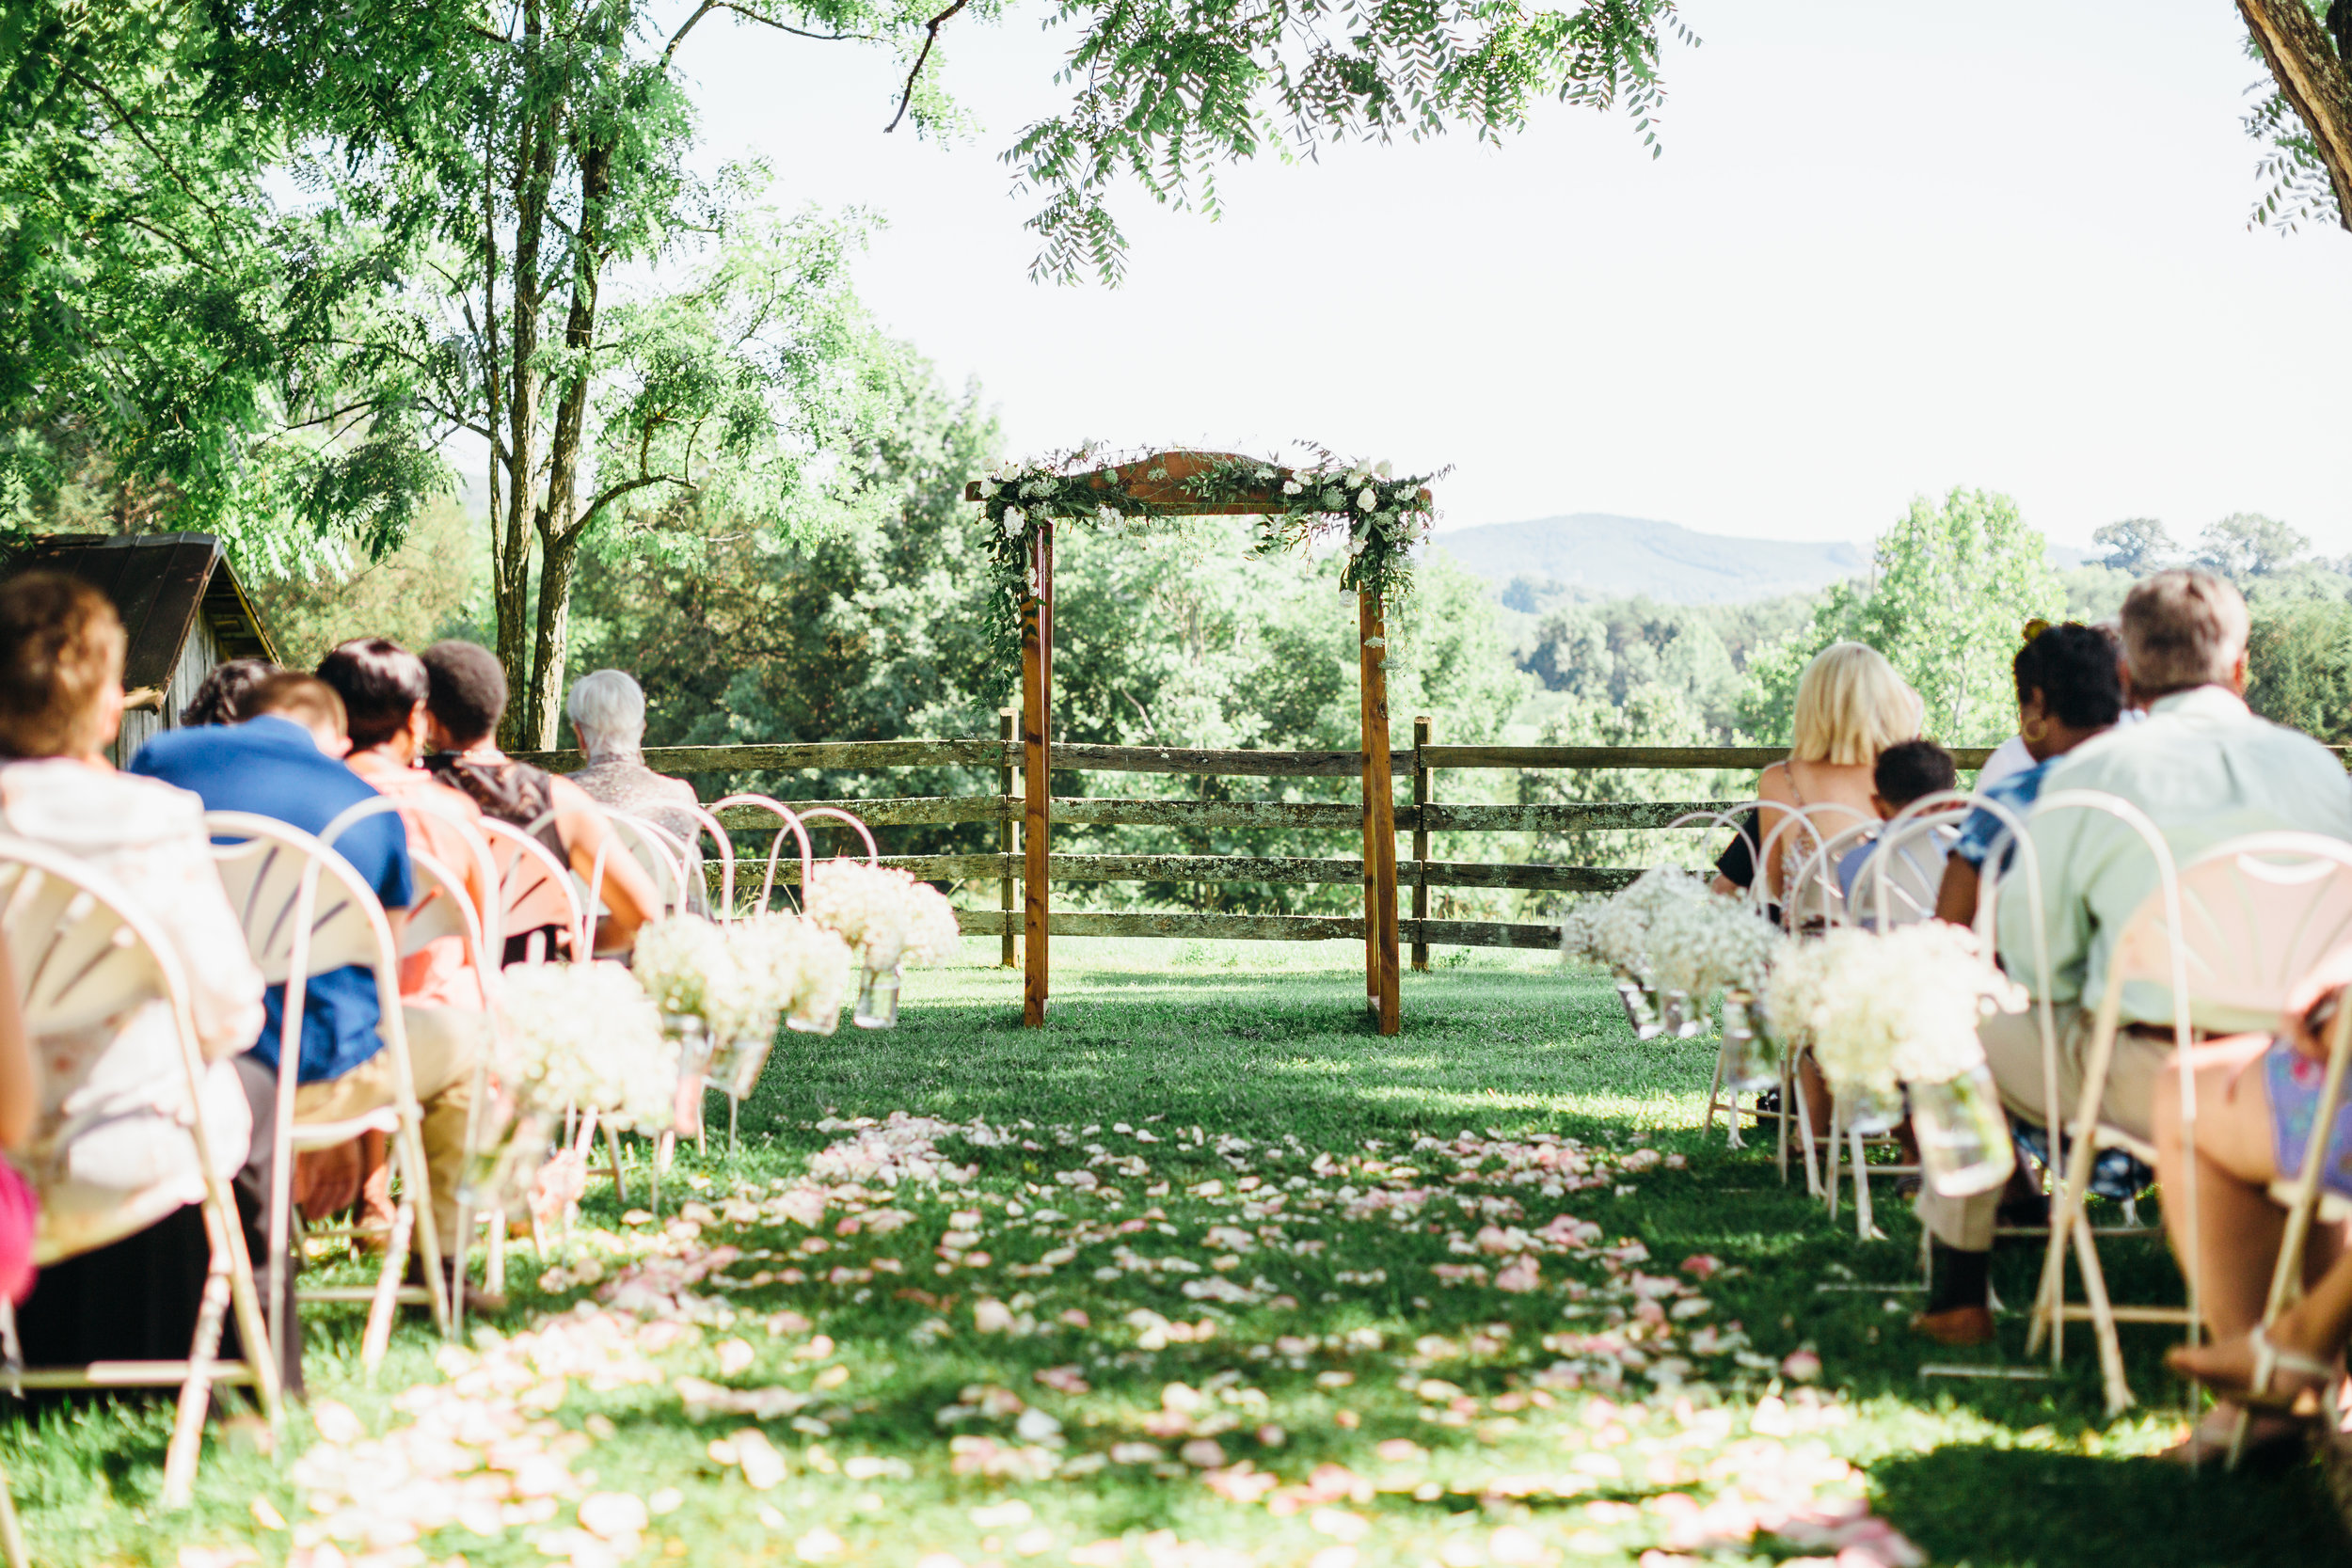 Lynchburg Wedding Photographer; Lynchburg Photographer; Lynchburg Wedding; Sorella Farms Wedding; Virginia Wedding Photographer; Virginia Wedding-8.jpg